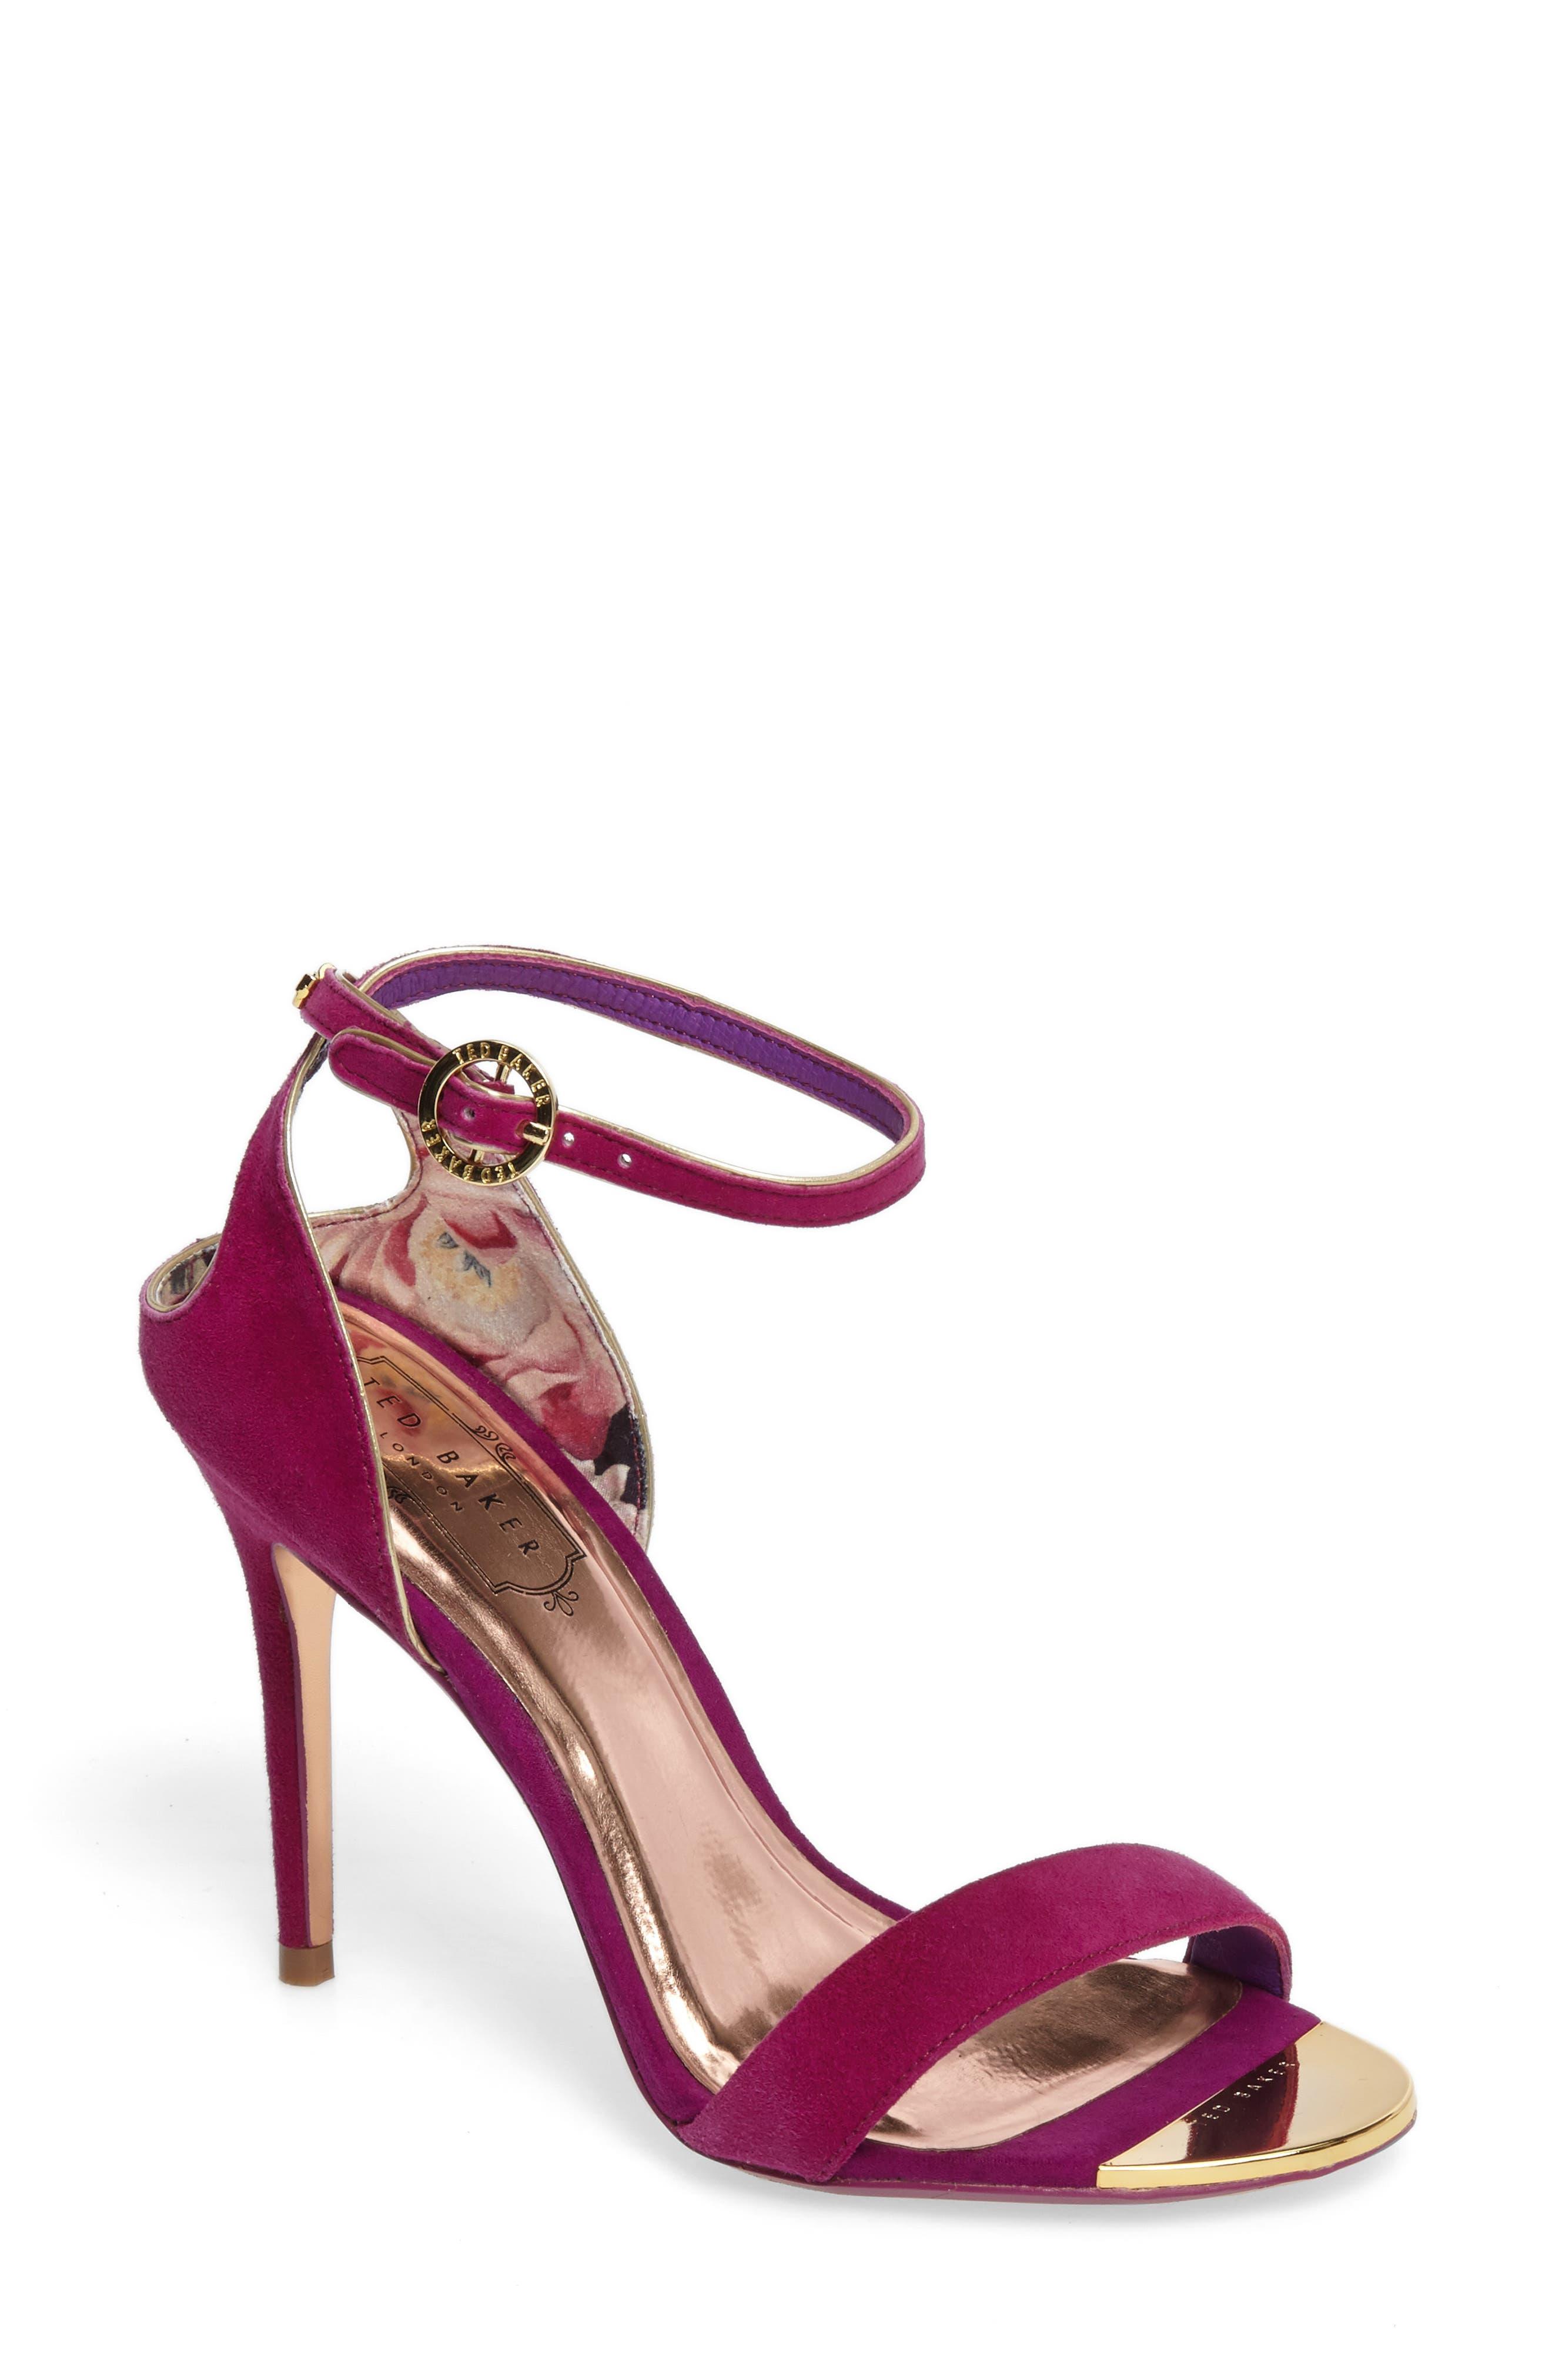 Mirobell Ankle Strap Sandal,                             Main thumbnail 3, color,